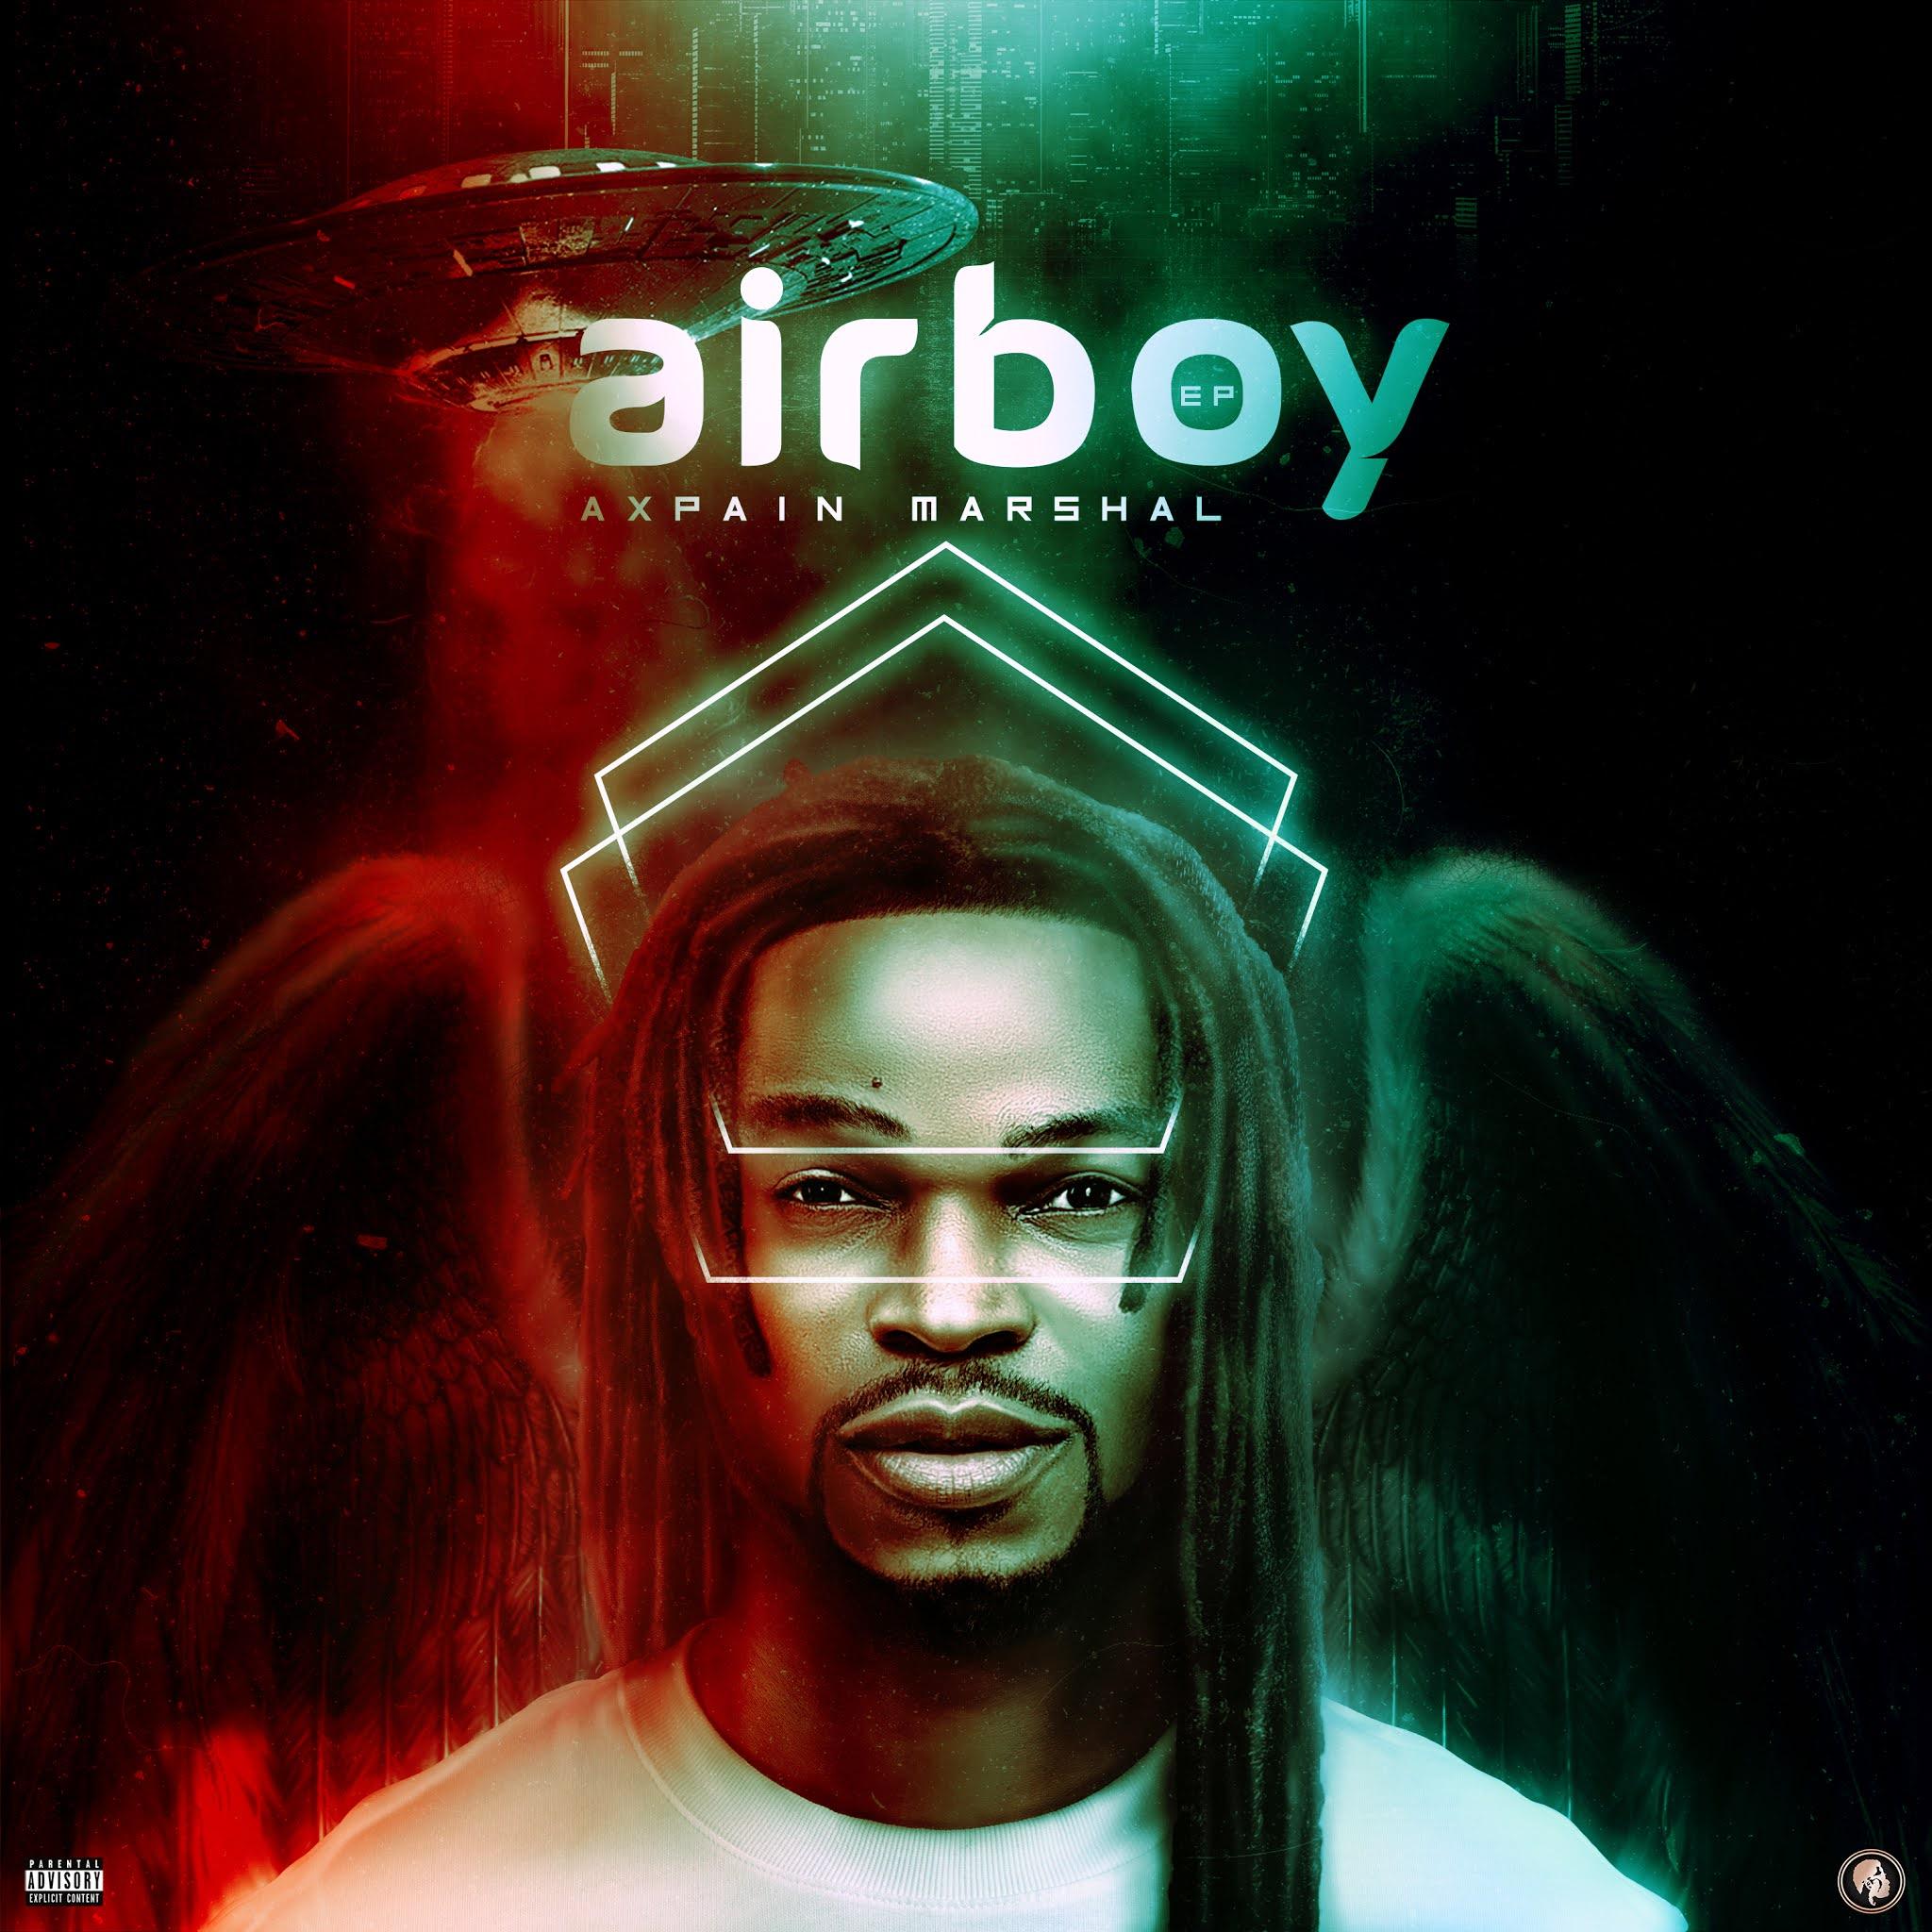 Axpain Marshal - Air Boy [EP]